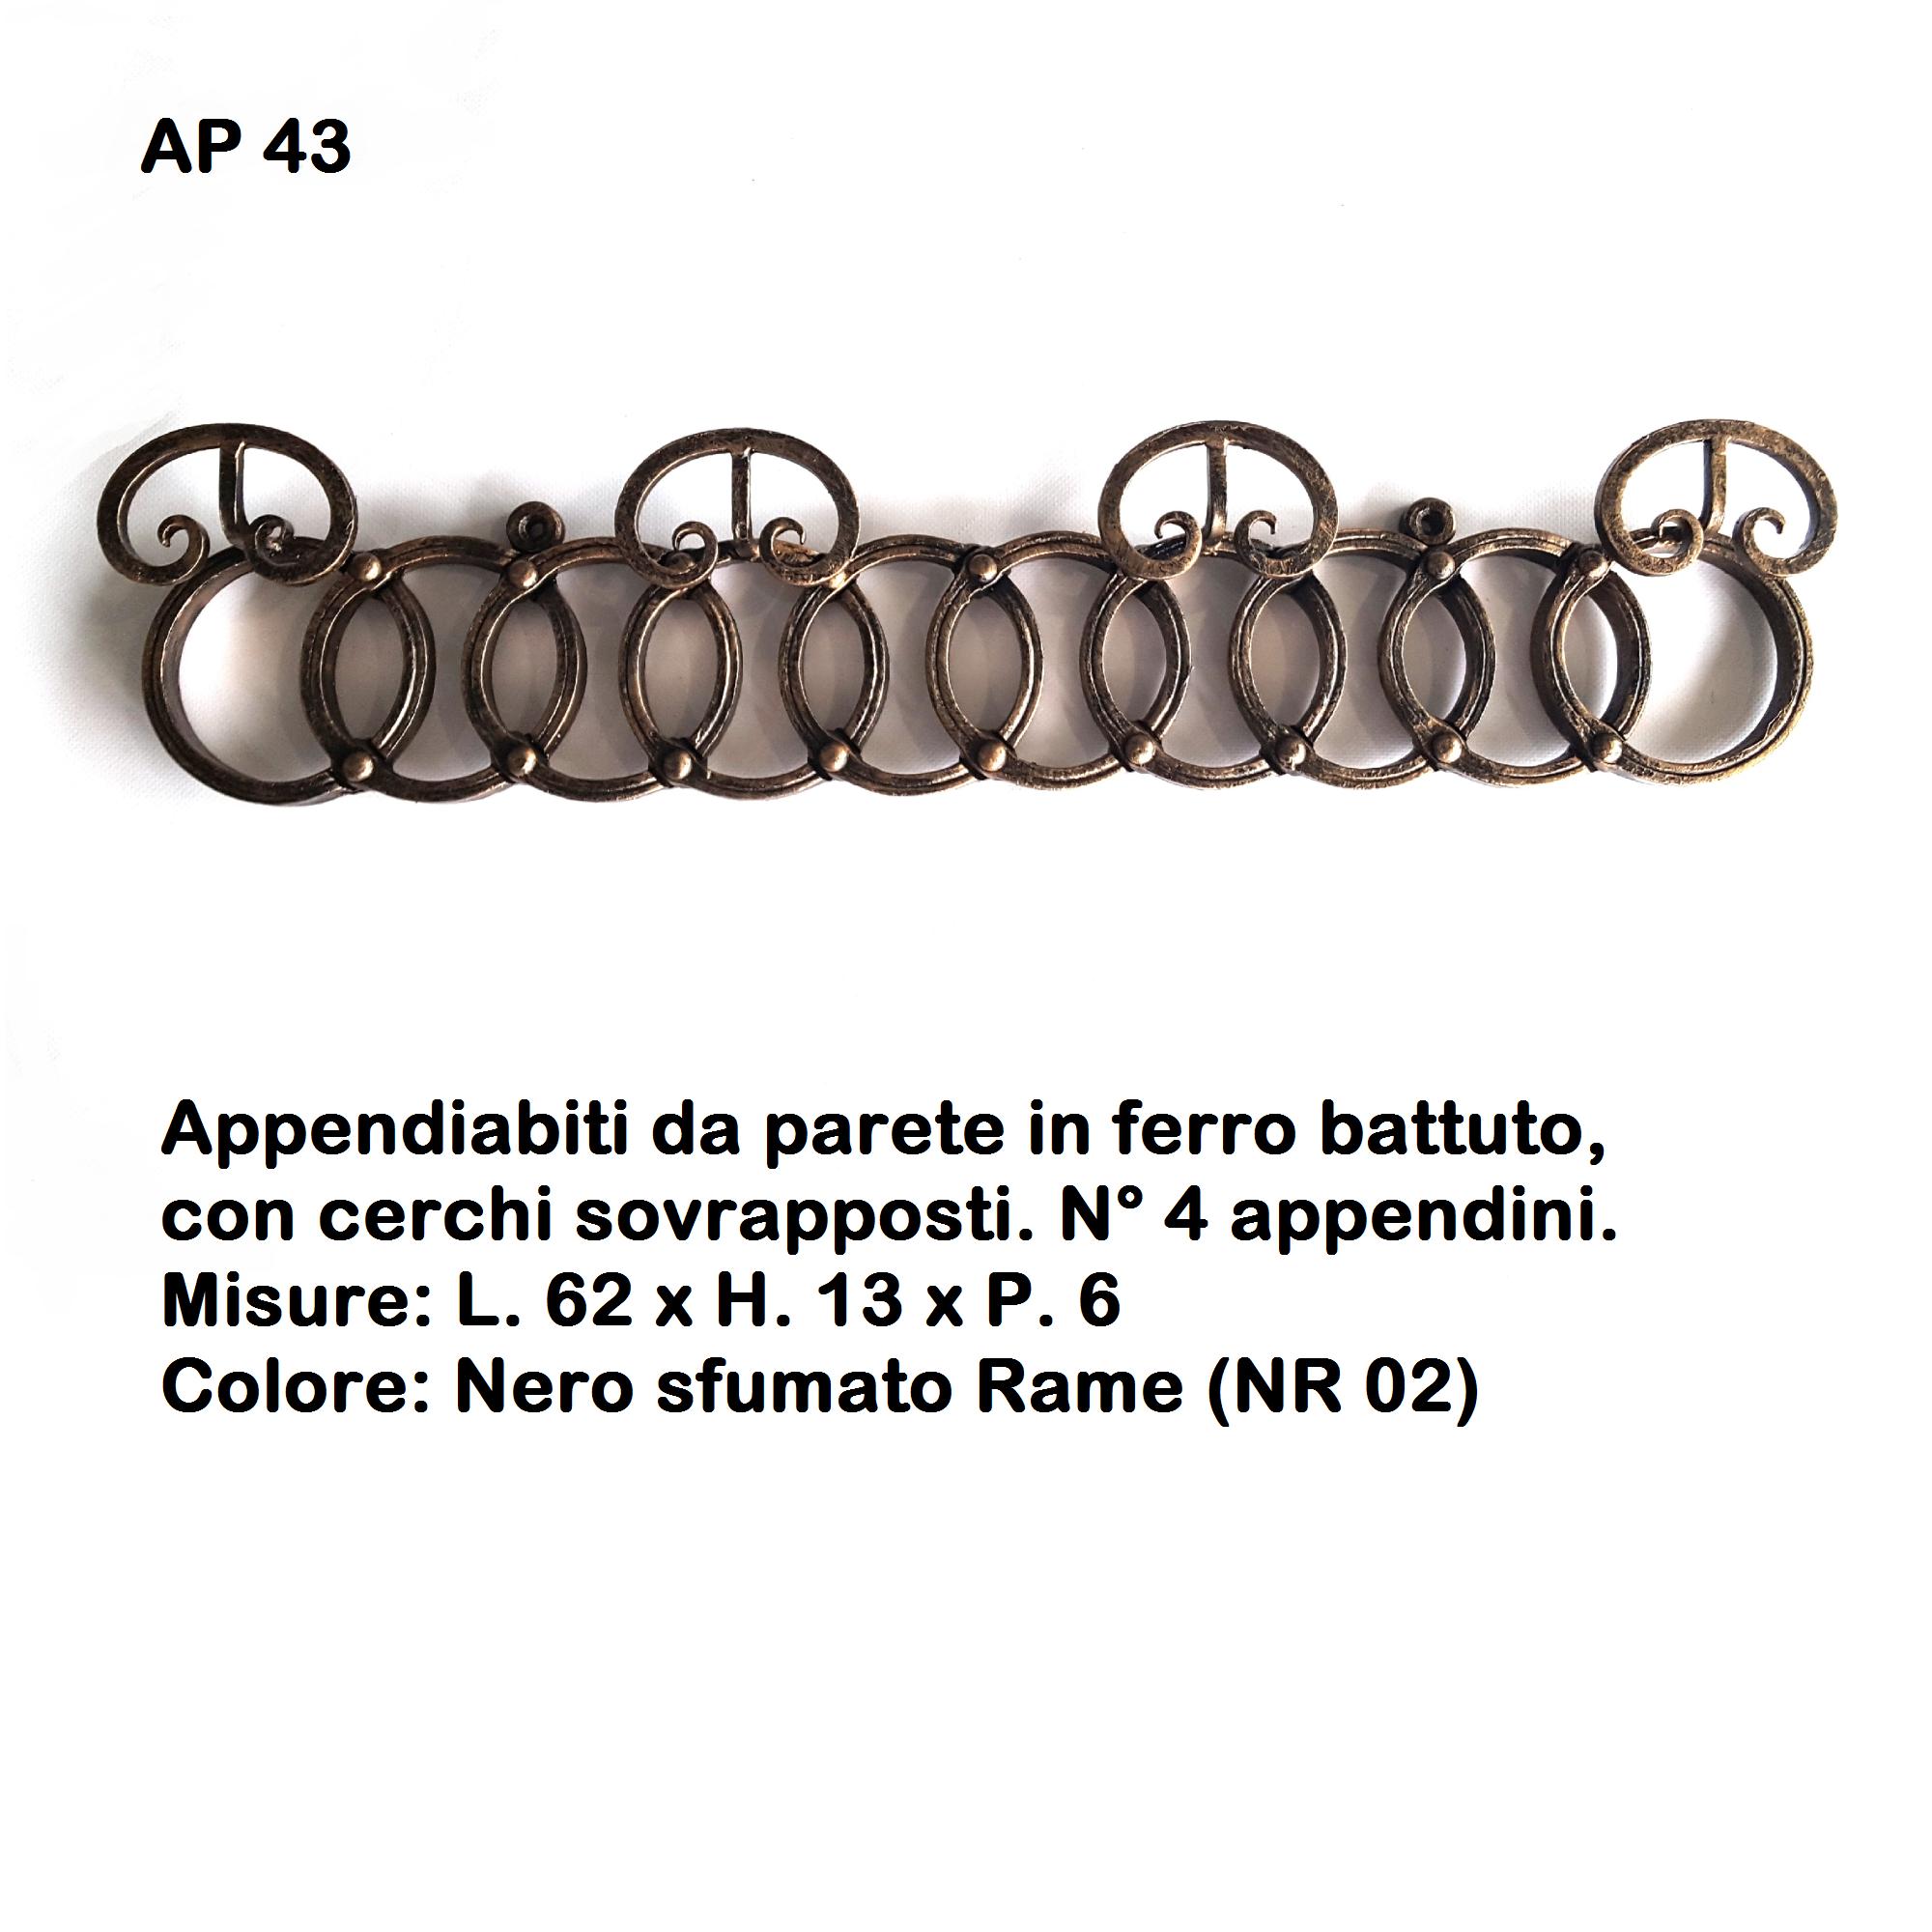 Appendiabiti In Ferro Da Parete.Appendiabiti Da Parete In Ferro Battuto Ap 43 Iron Art